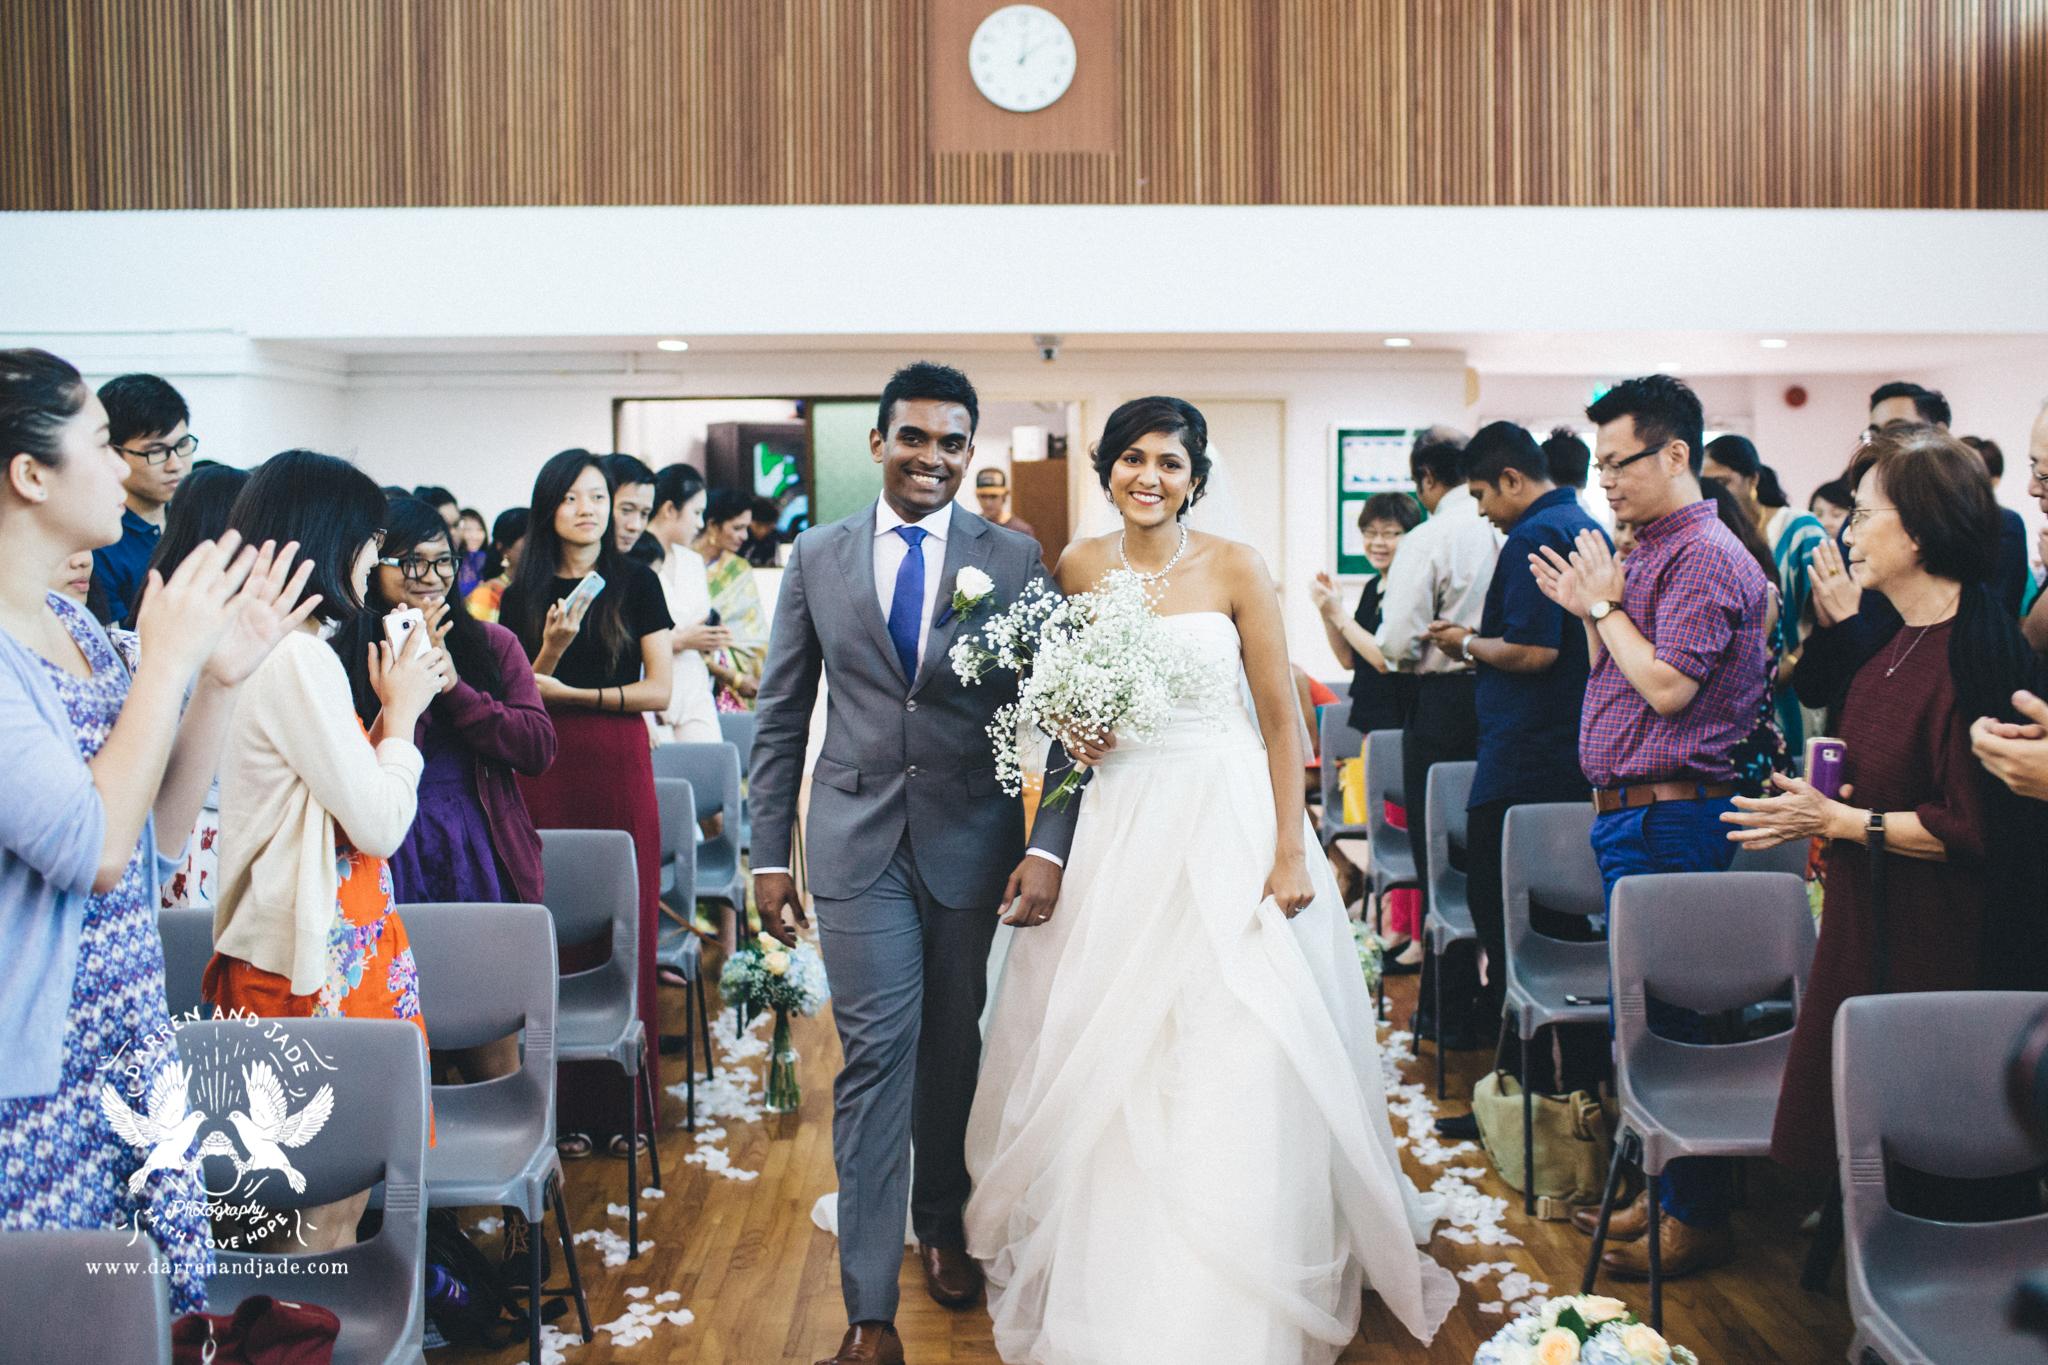 Amitha & Kumuthan - Wedding Blog (38 of 60).jpg